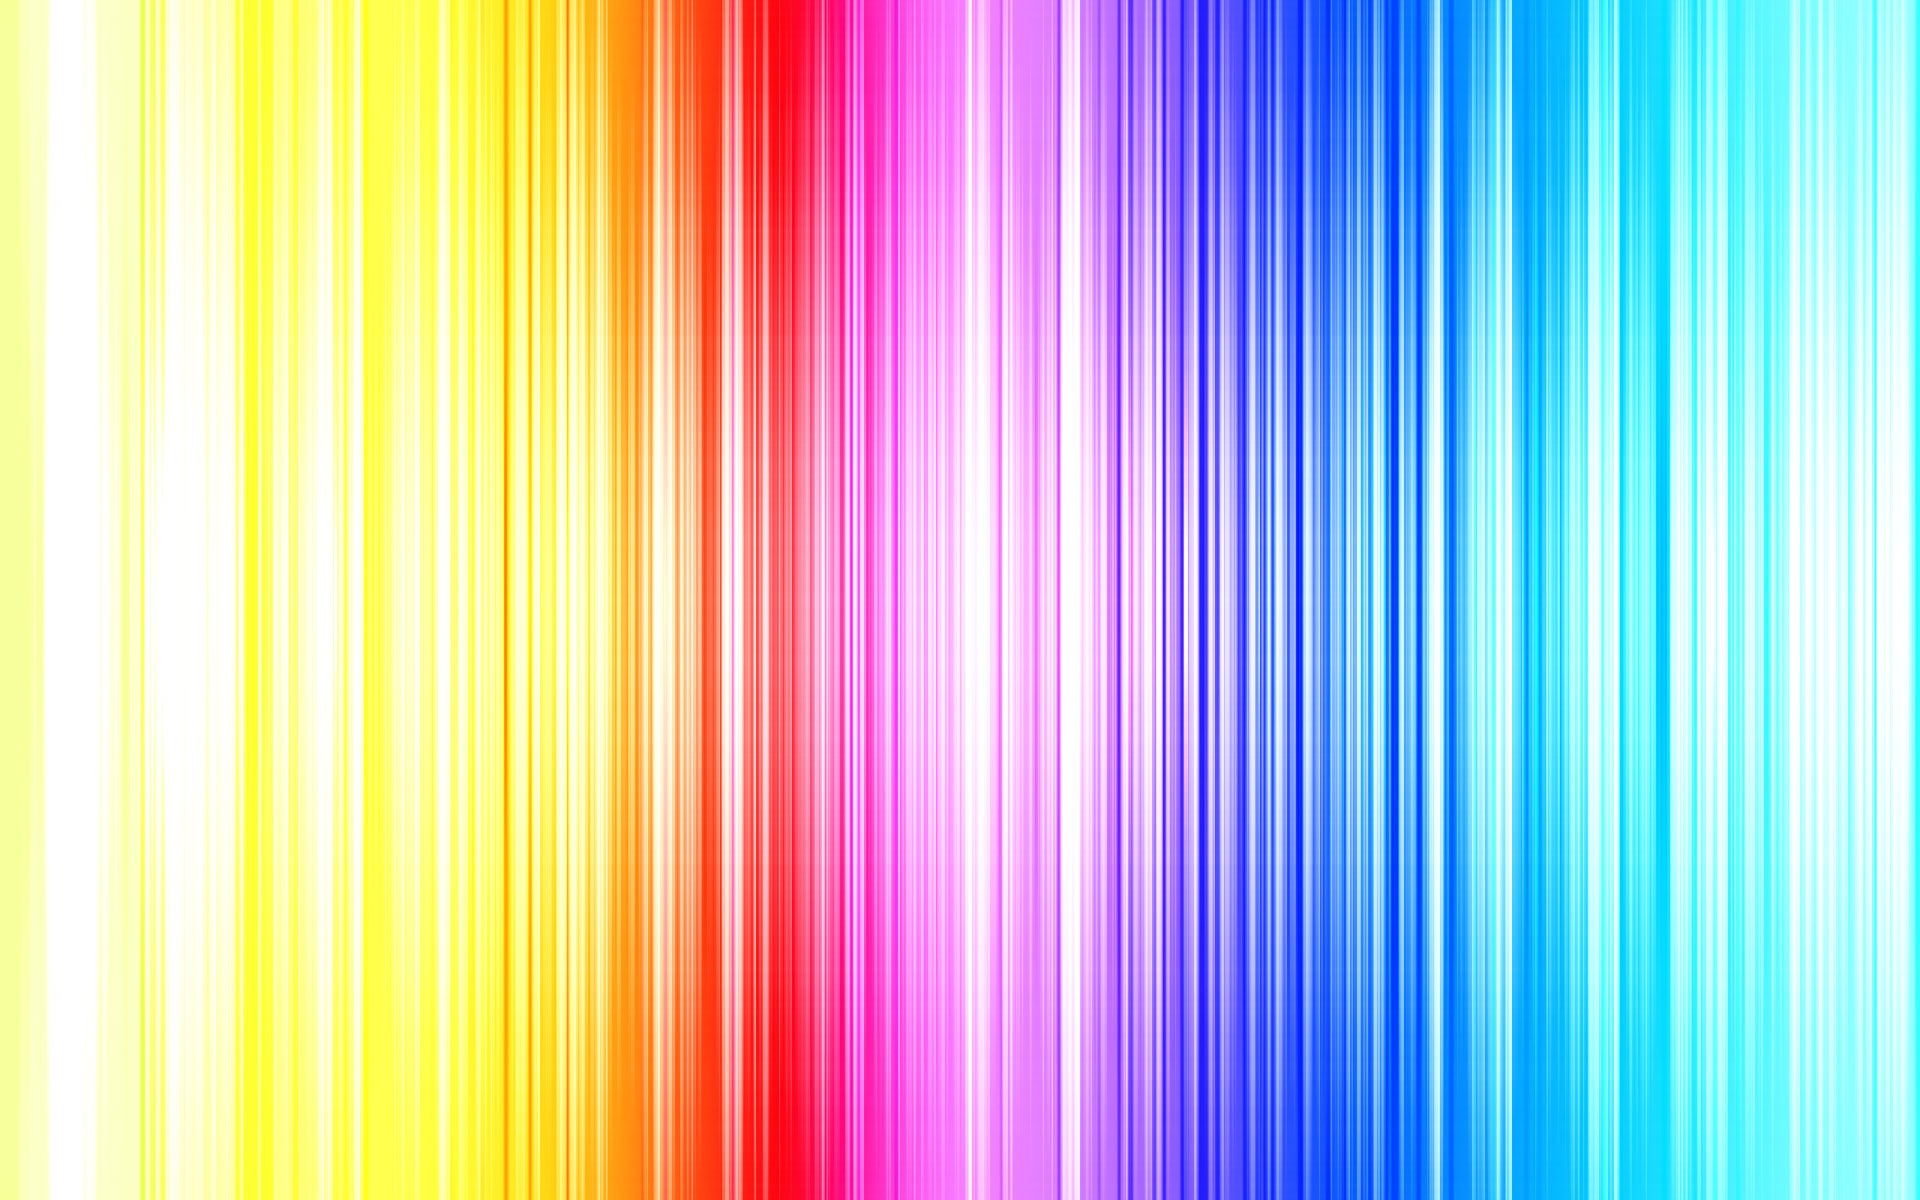 Bright Color Wallpaper for Desktop 1920x1200